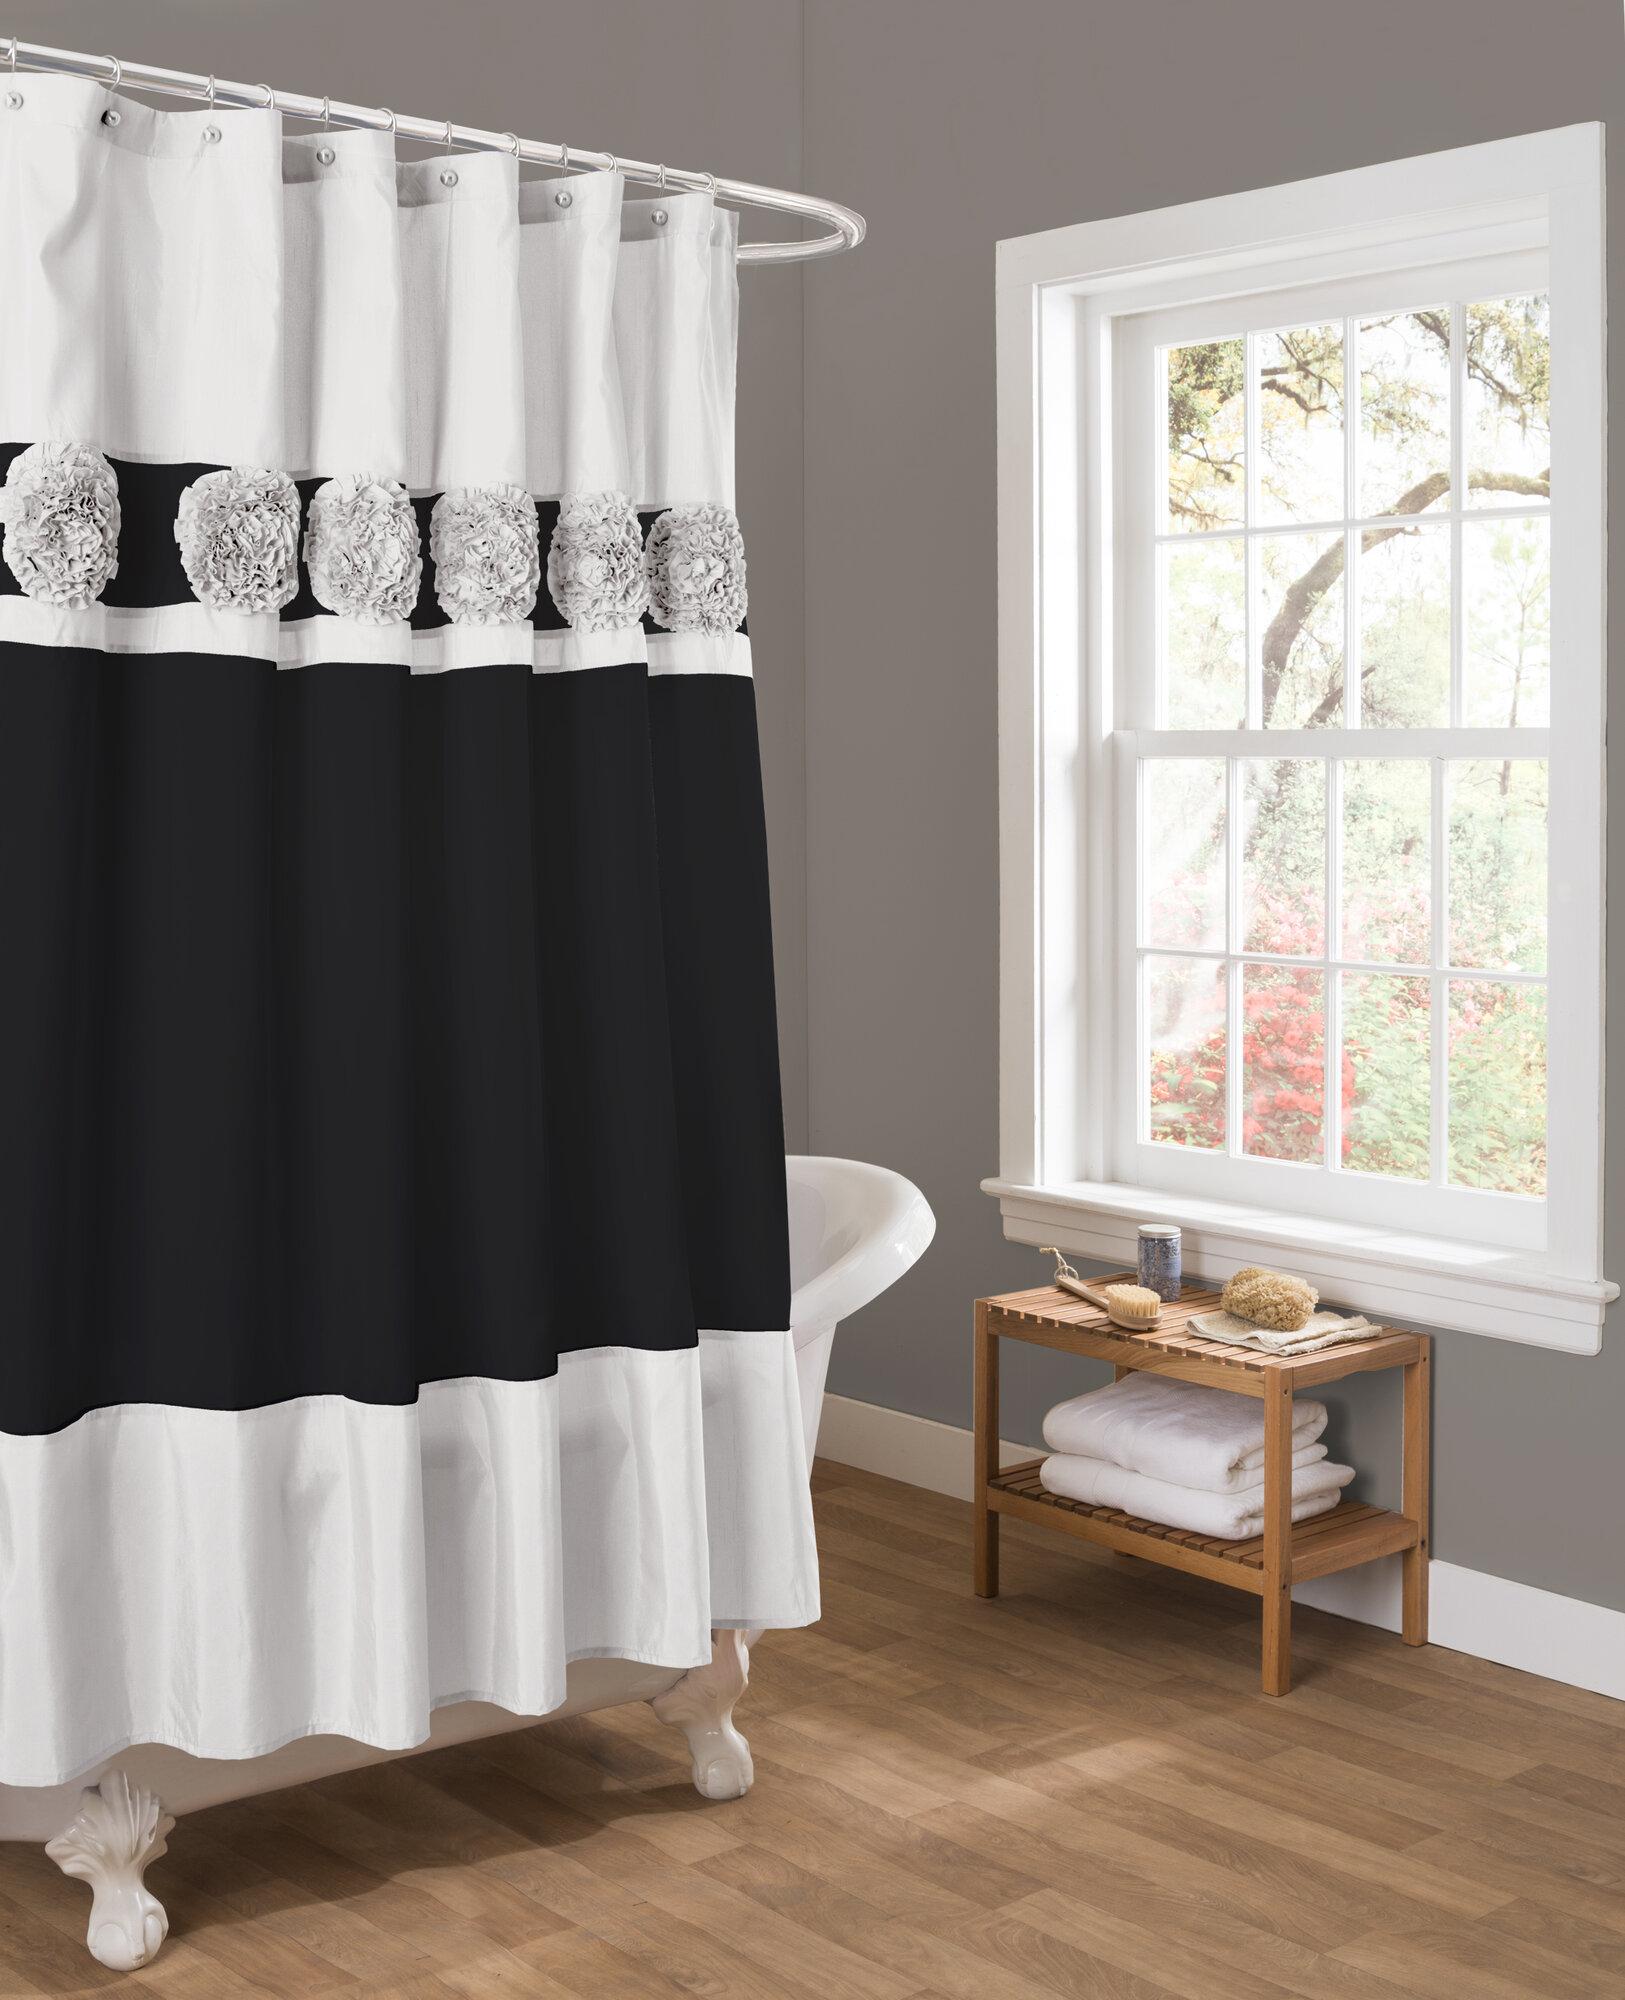 Special edition by lush decor seascape shower curtain ebay for Seascape bathroom ideas